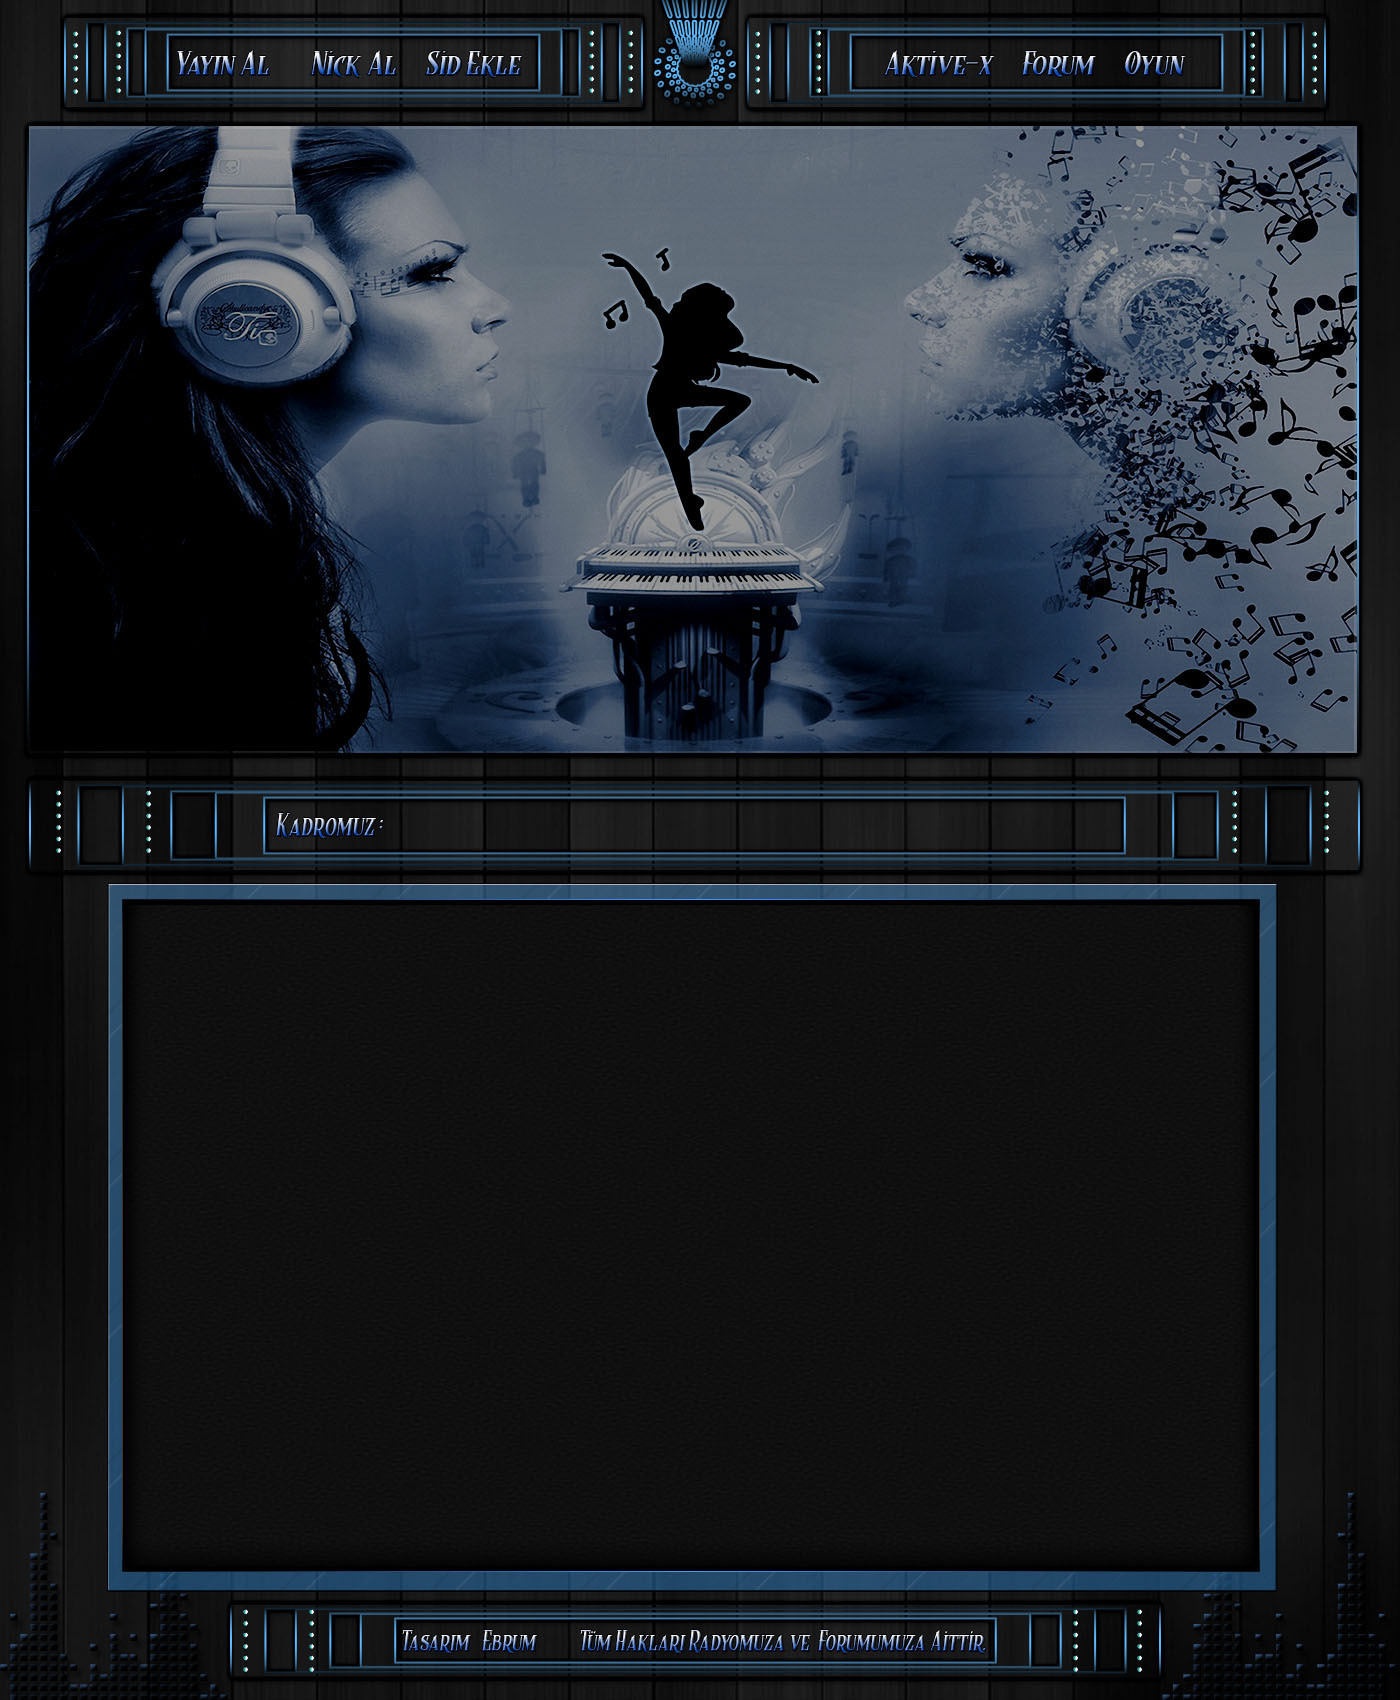 Gri Blue Müzik Dans Radyo İndex [1000x650 Boyutunda]